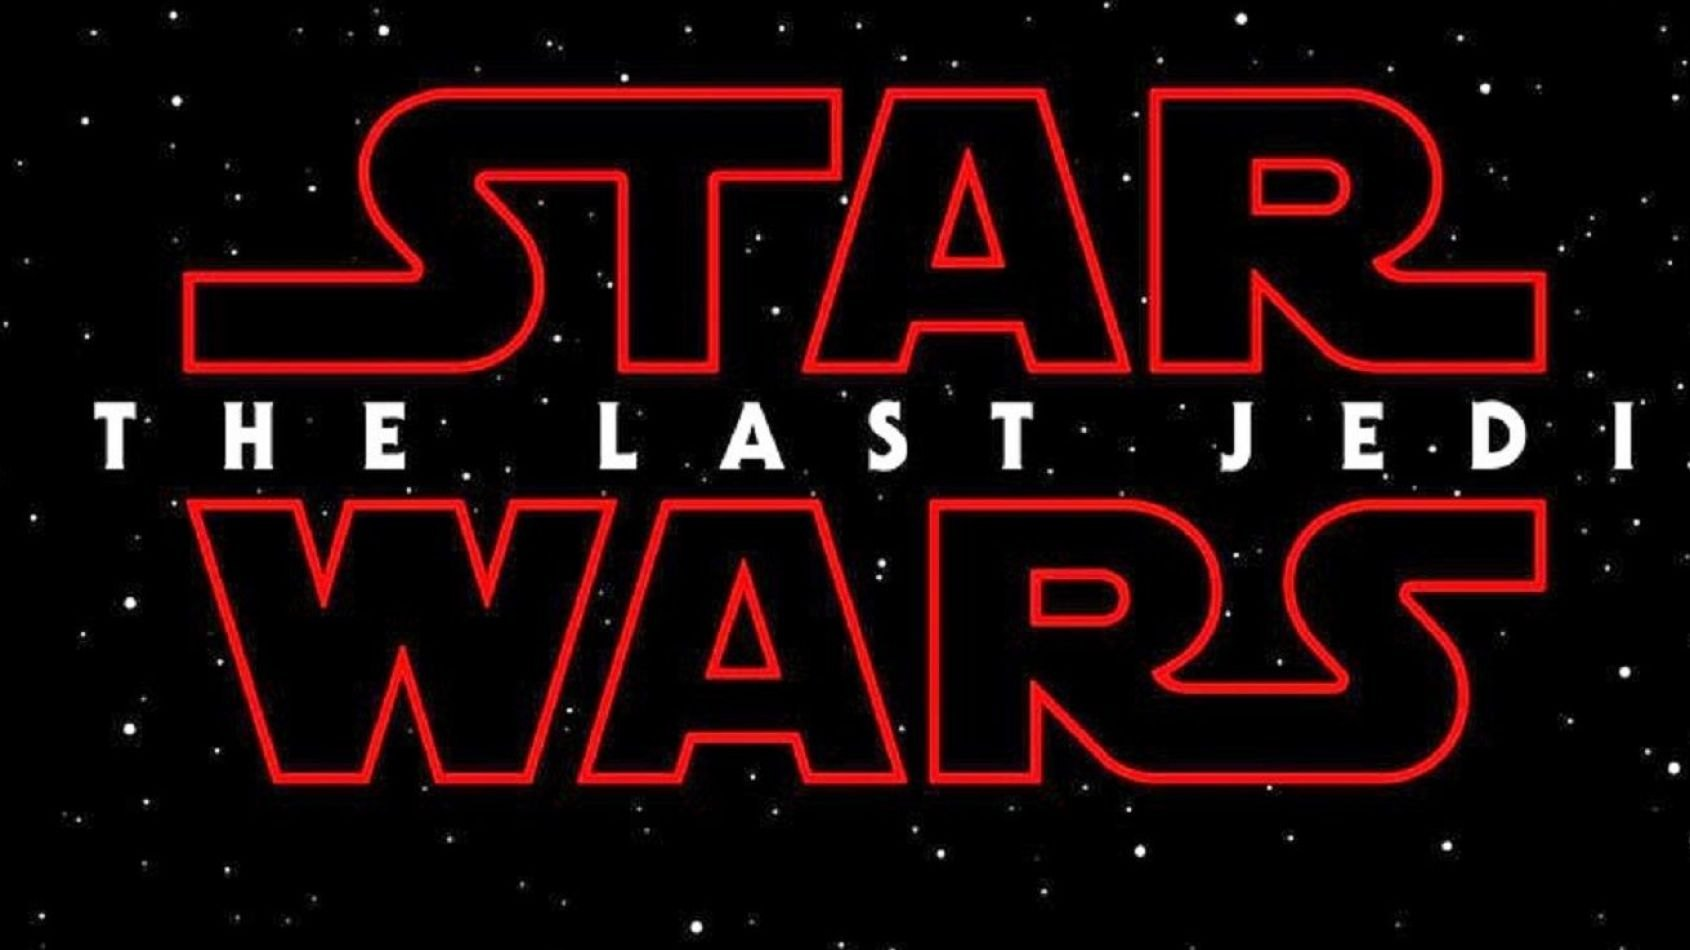 Casting 3 étoiles — Star Wars